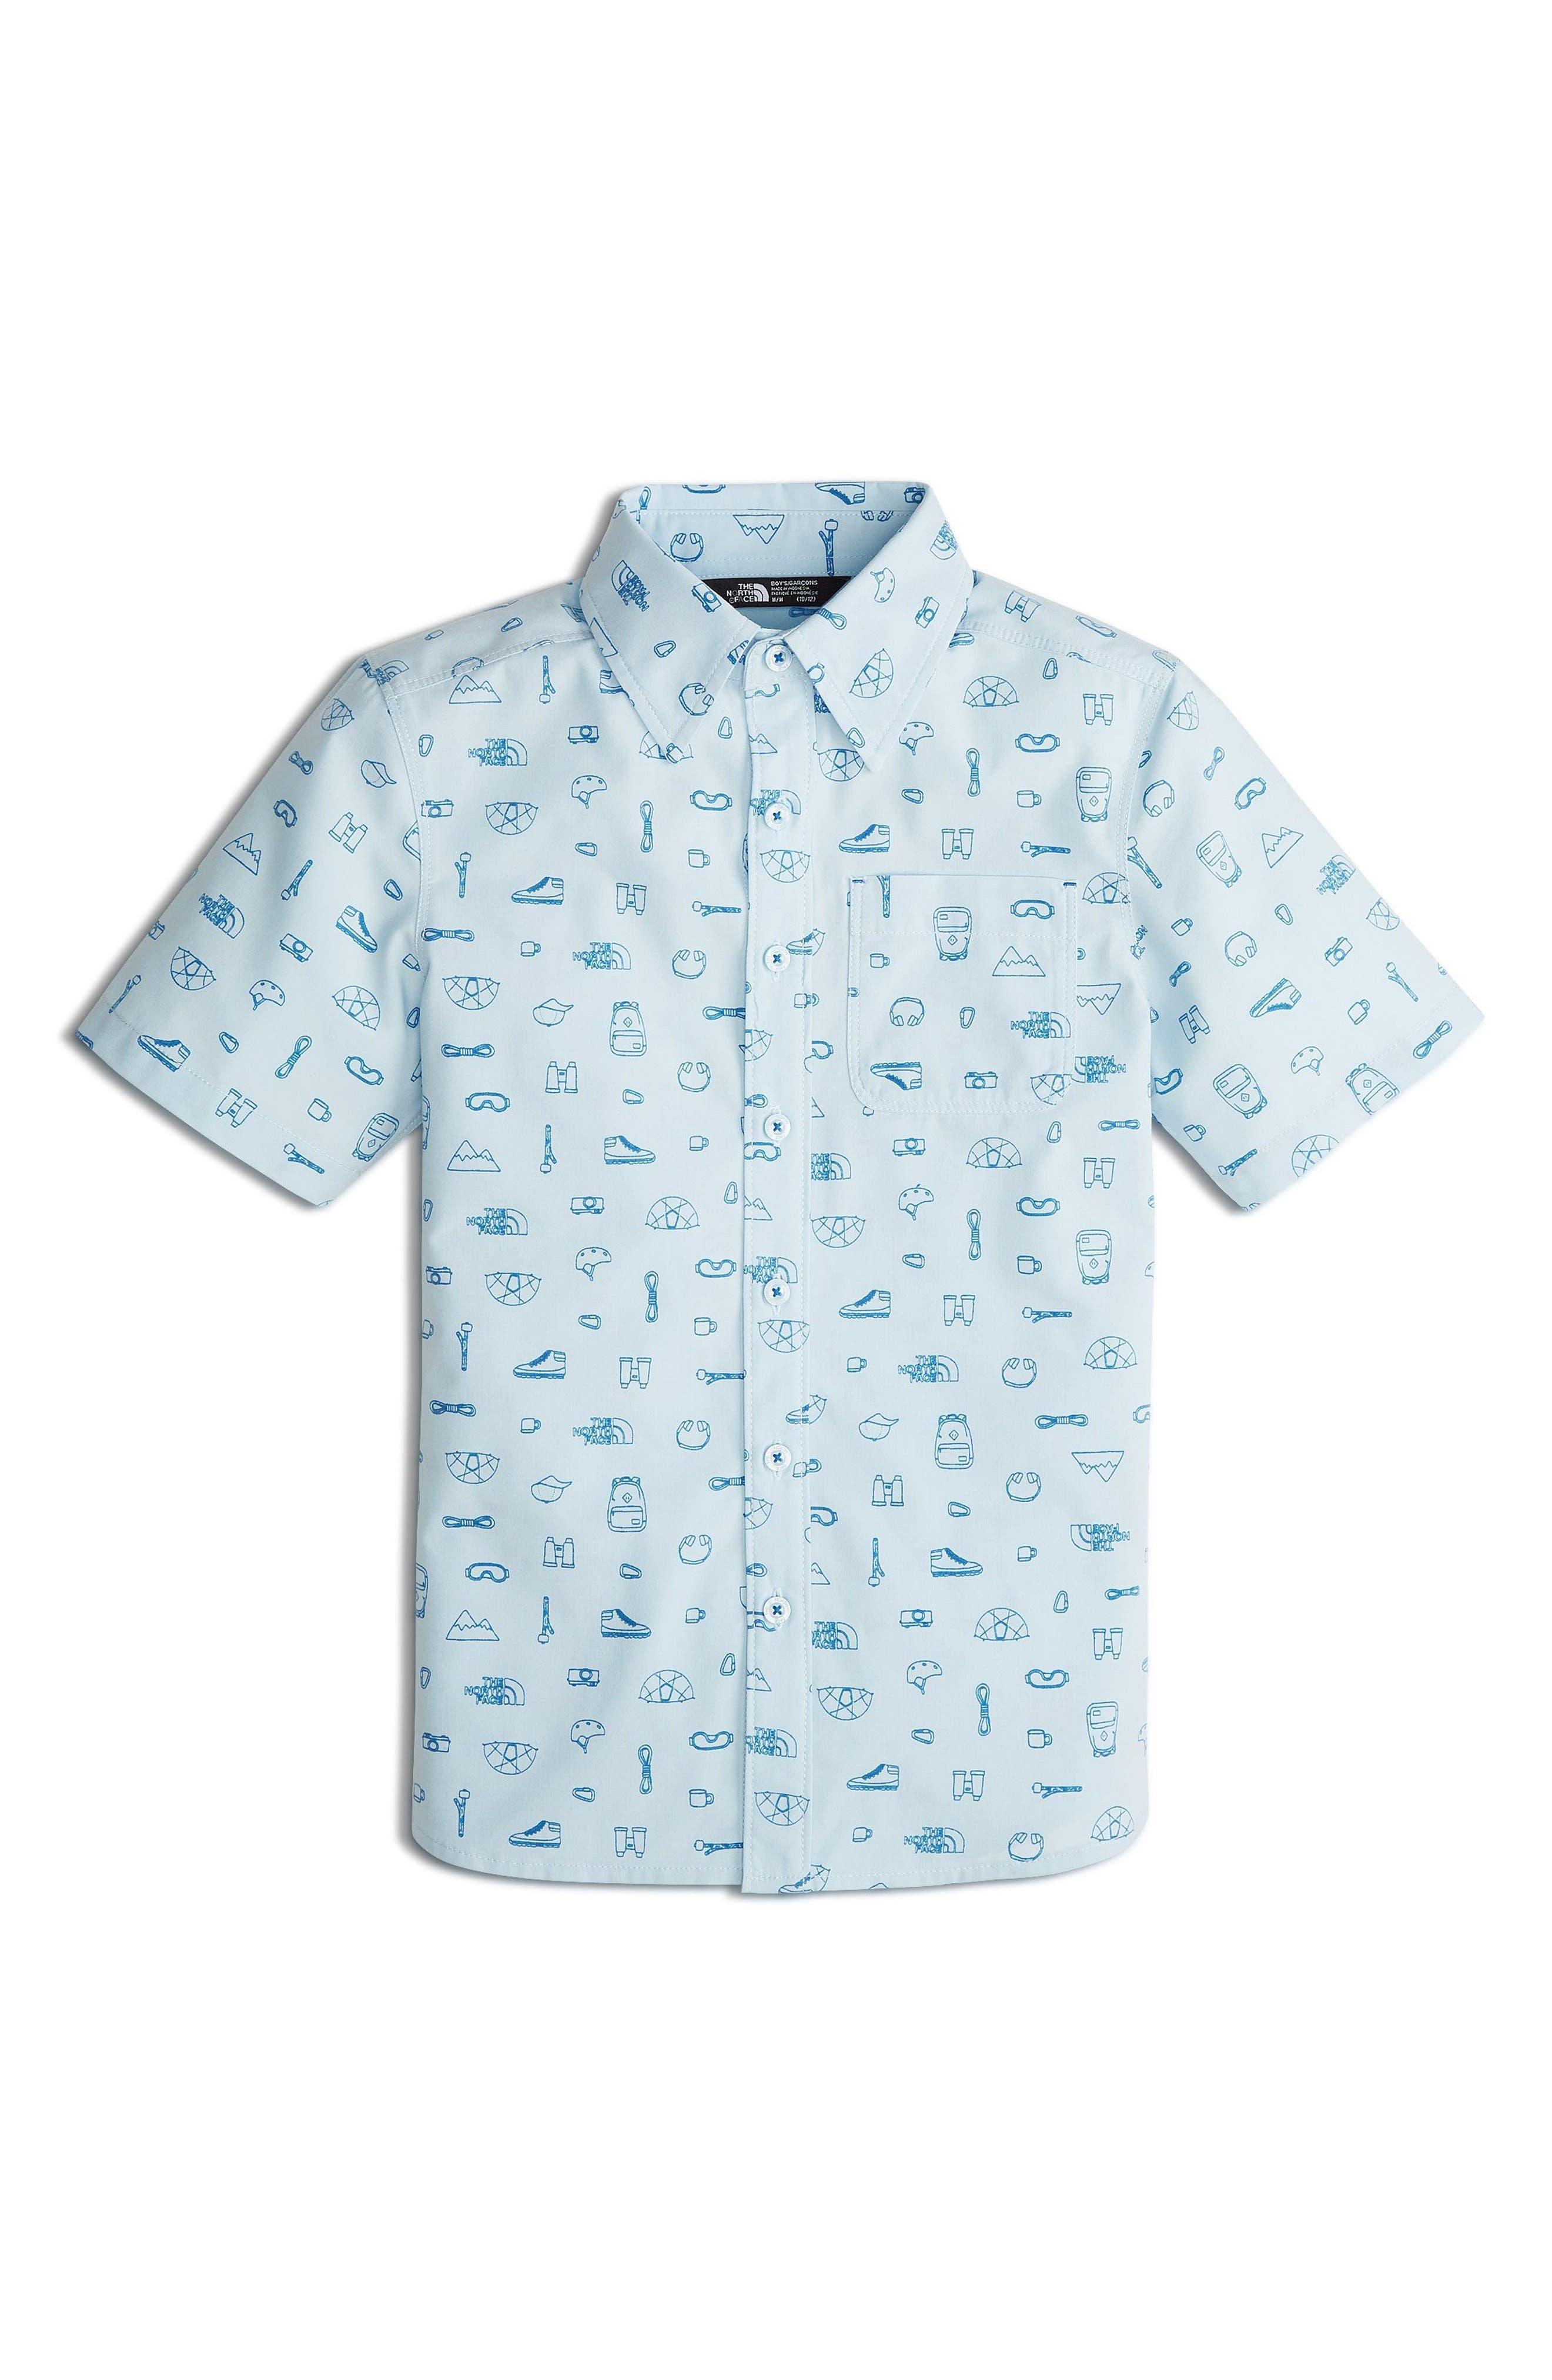 Main Image - The North Face Pursuit Print Woven Shirt (Big Boys)